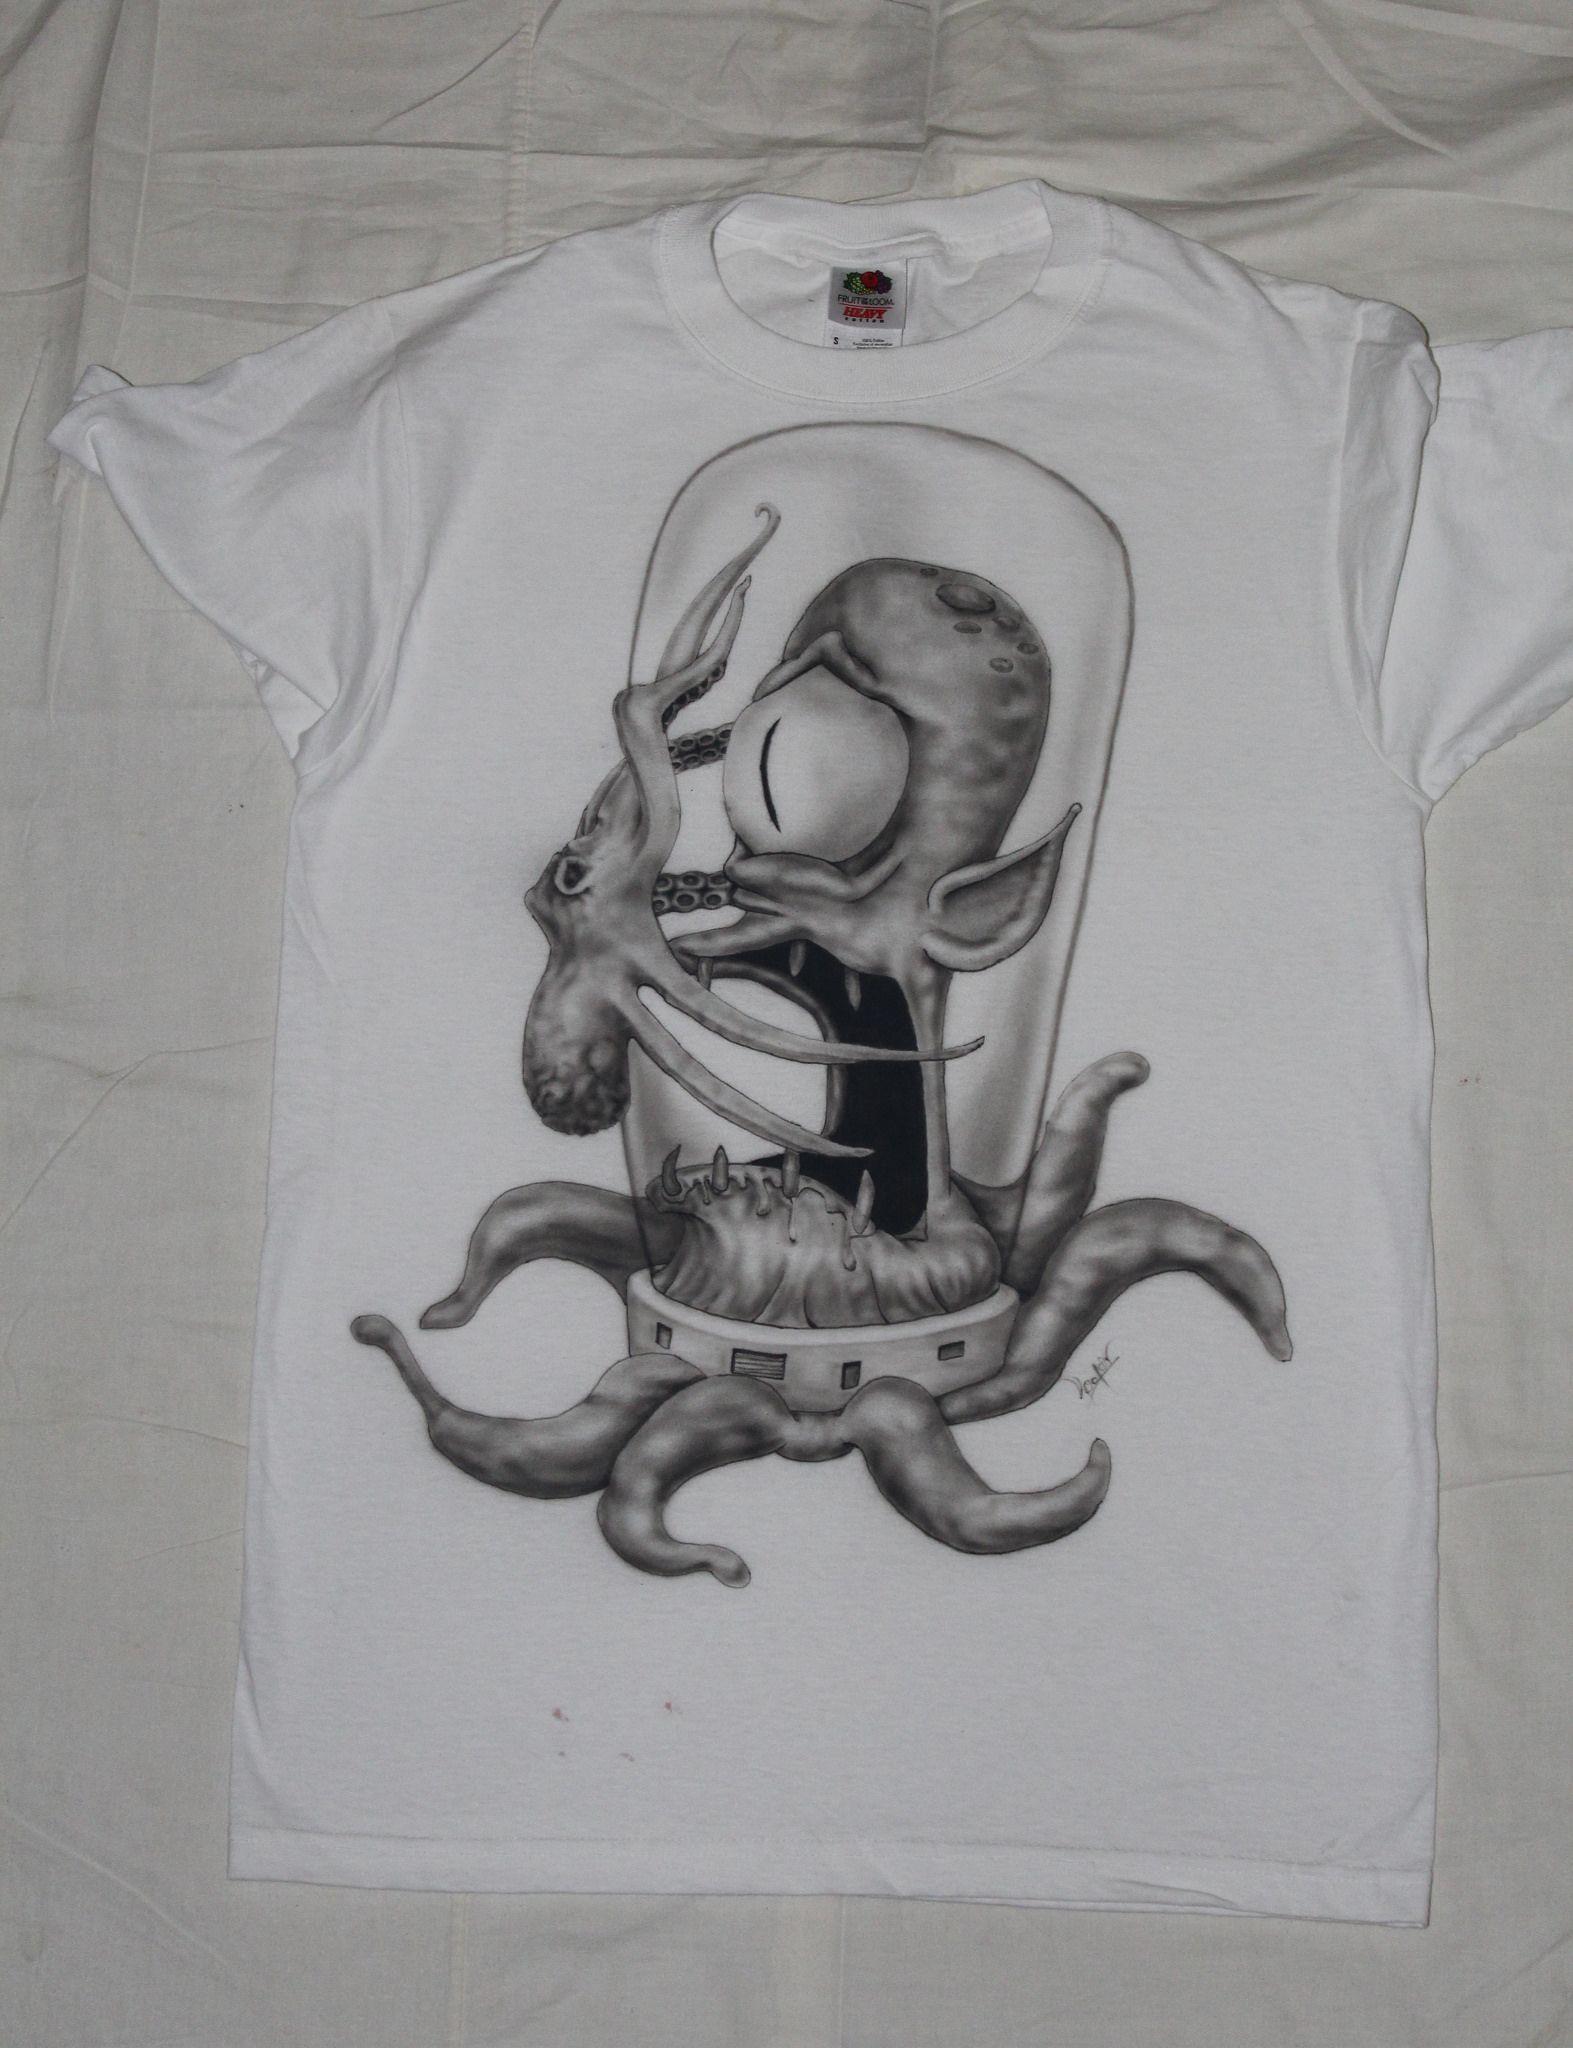 T-shirt design handmade -  Aliens Handmade T Shirt Design Prints Available In My Dbh Online Store